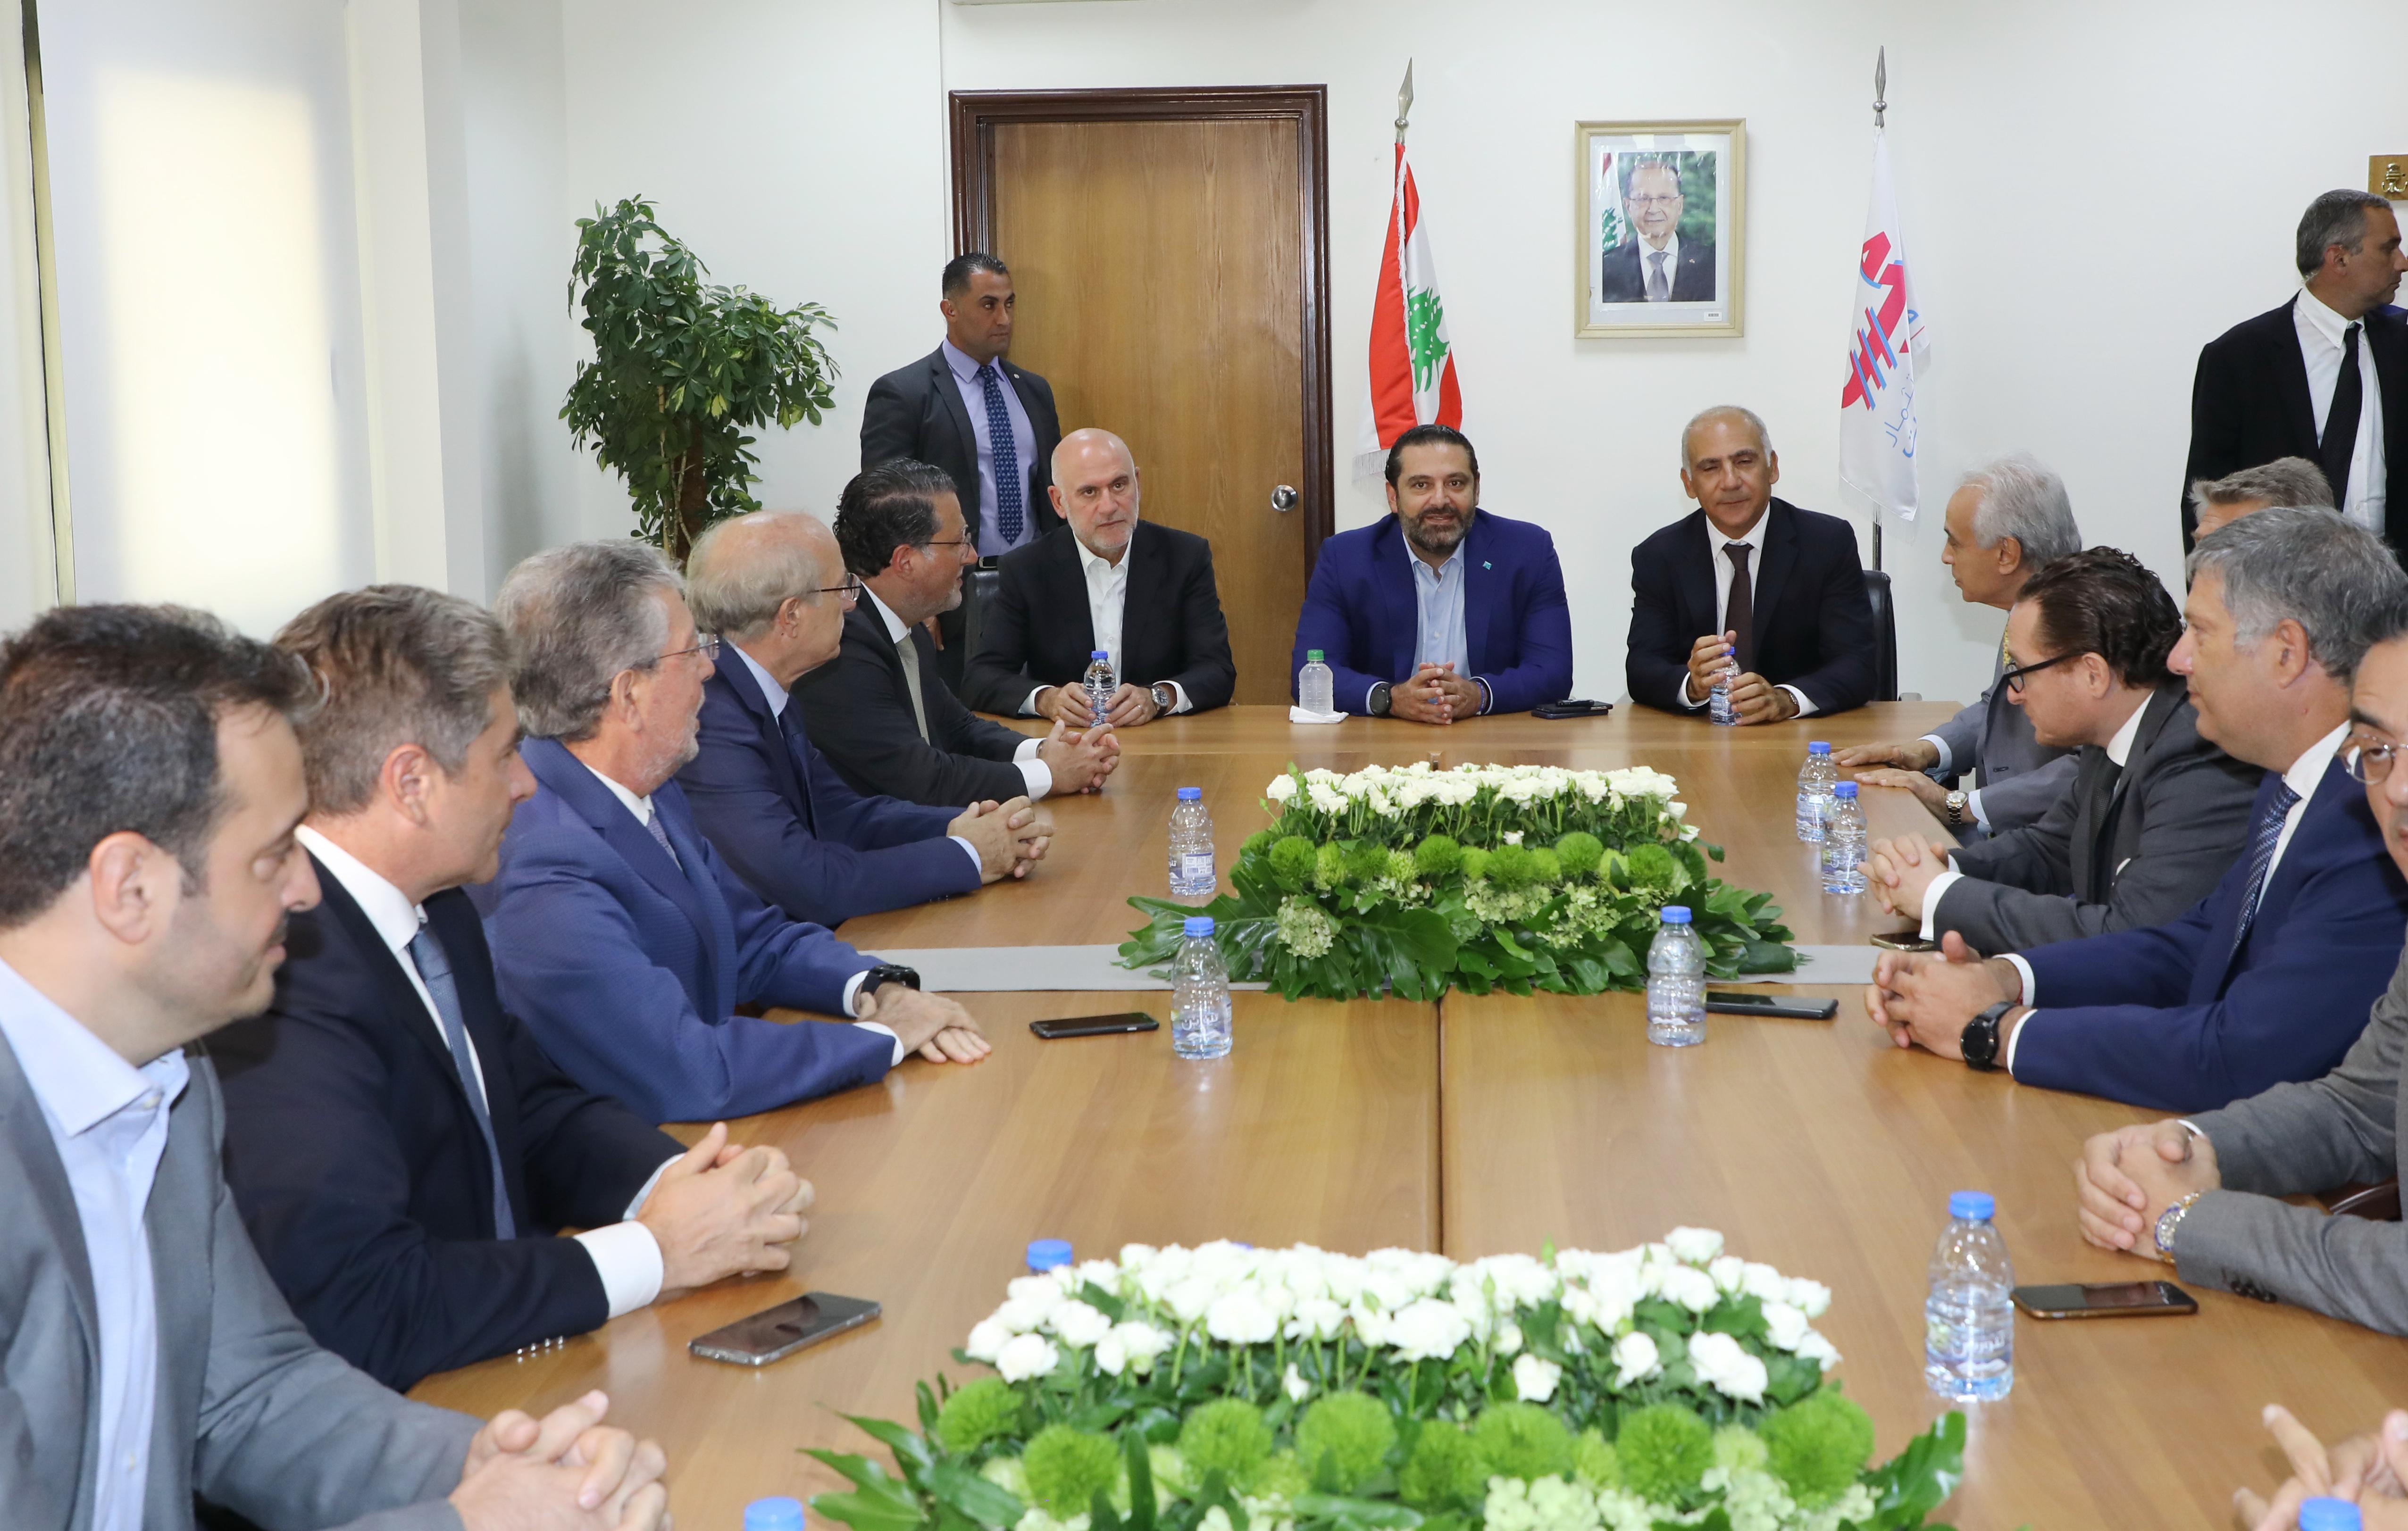 Pr Minister Saad Hariri Visits Beirut Ports 14